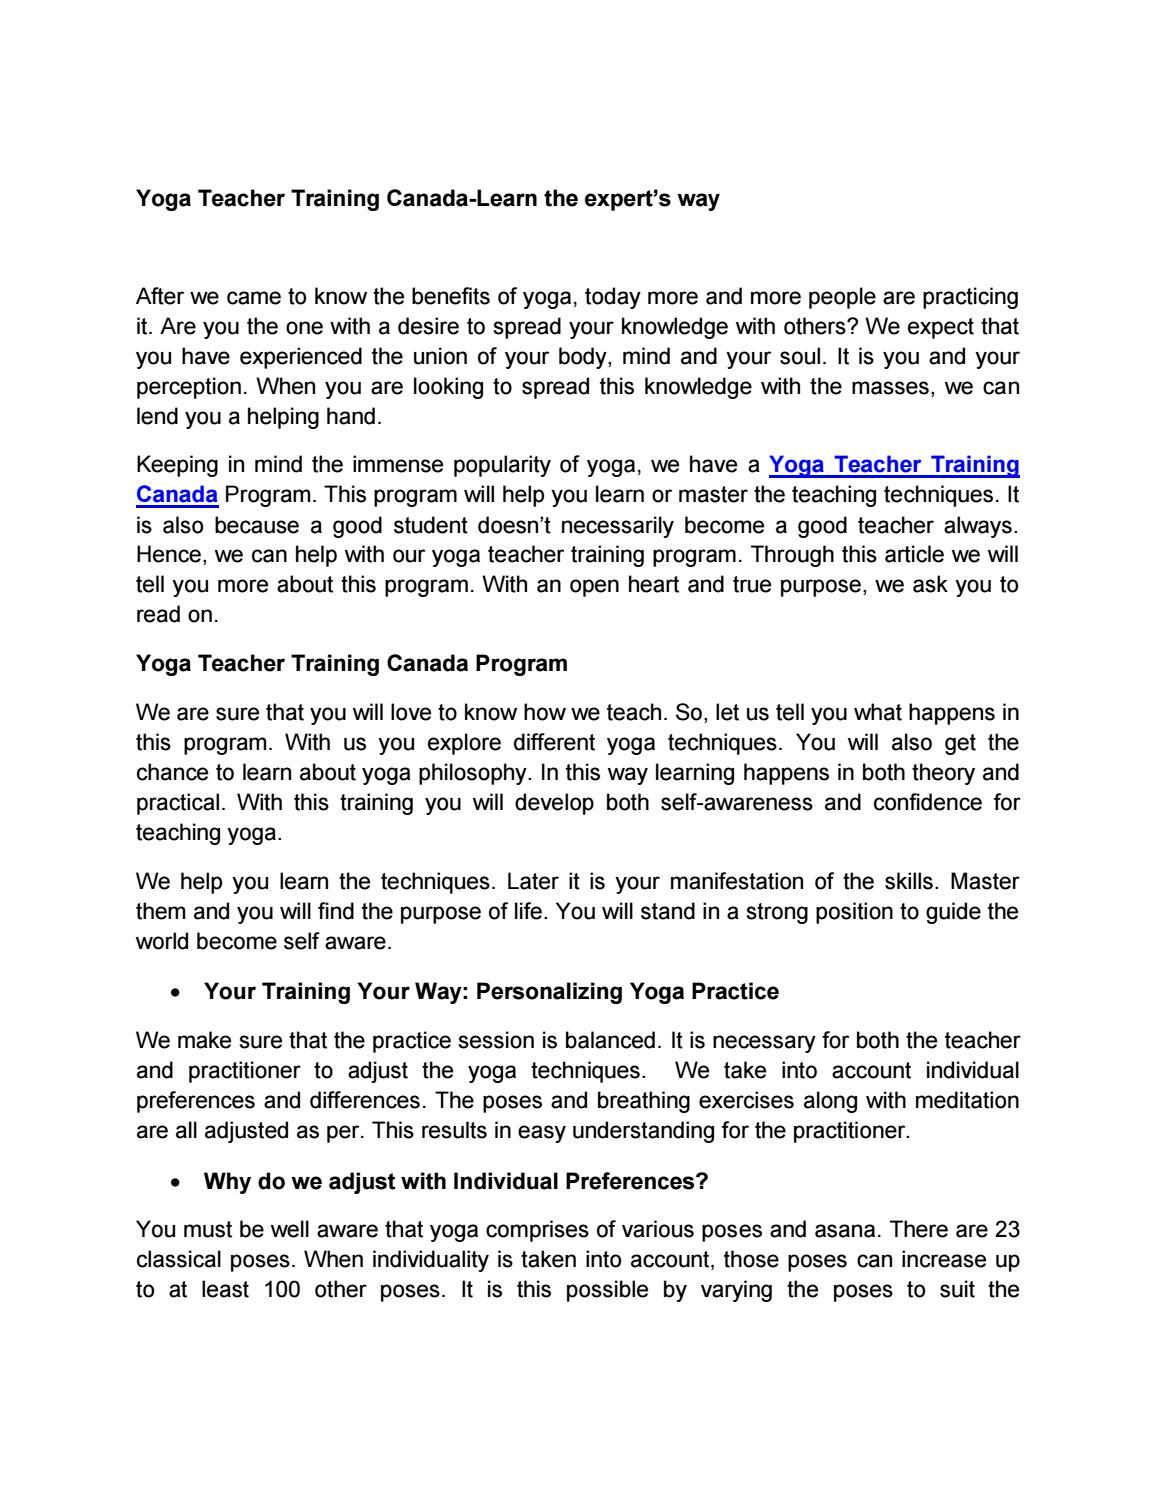 Yoga Teacher Training Canada Learn The Expert S Way By Yogatogo Issuu